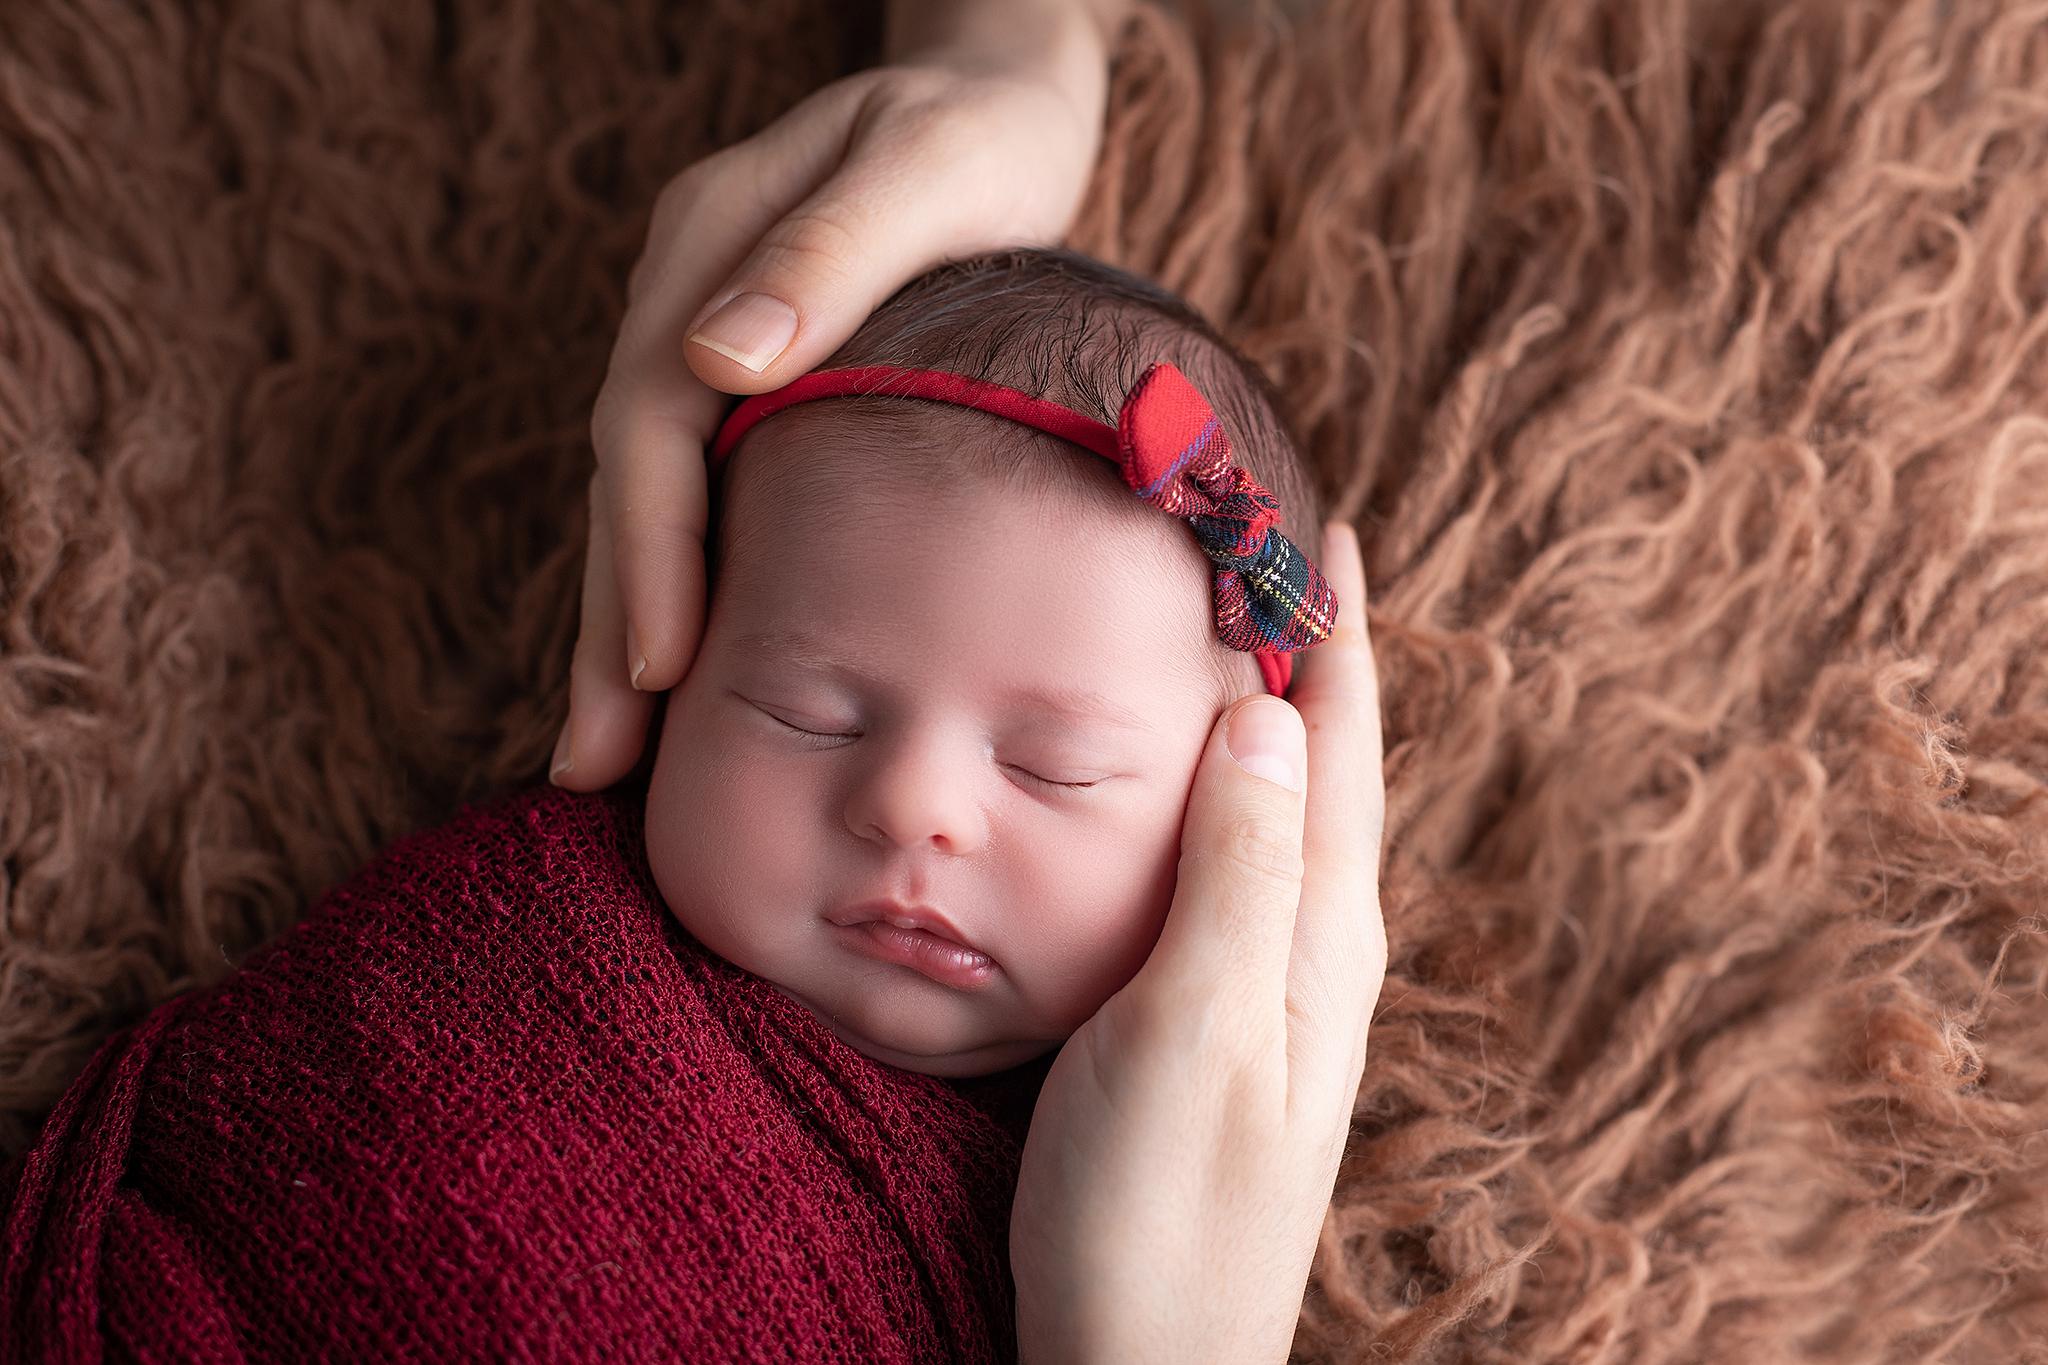 fotografie neonato varese